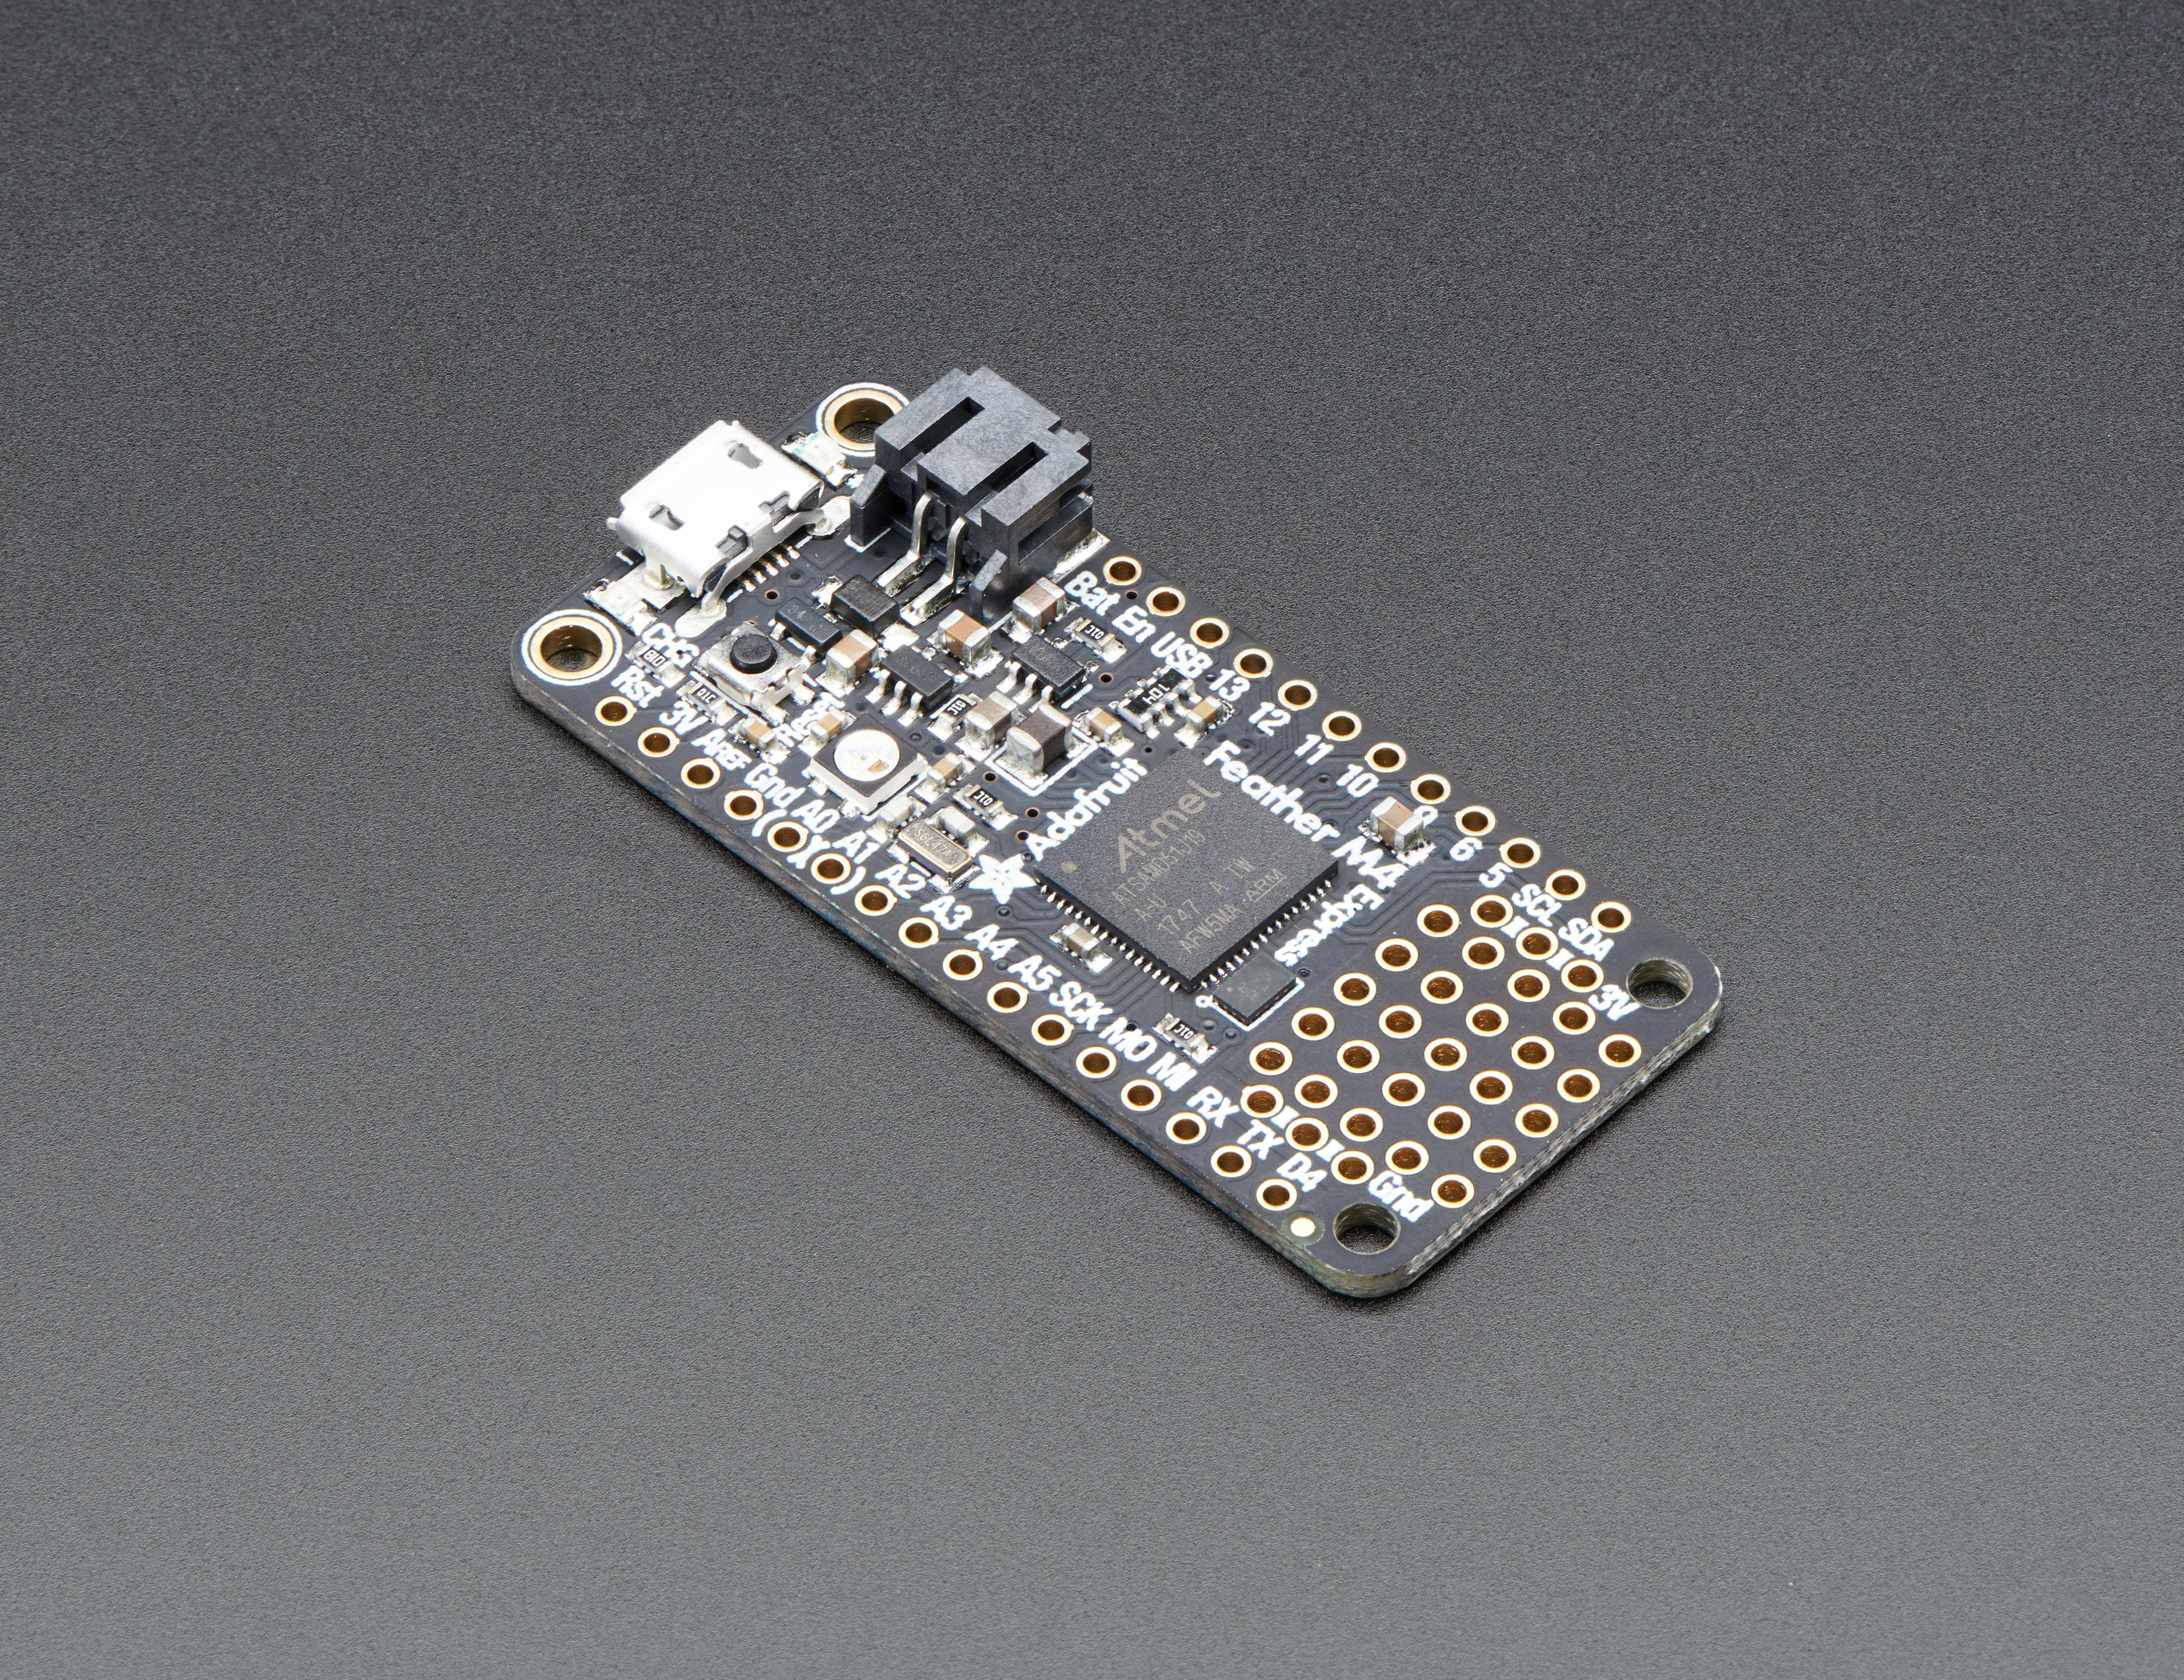 arduino_compatibles_3857_iso_ORIG_2018_06.jpg